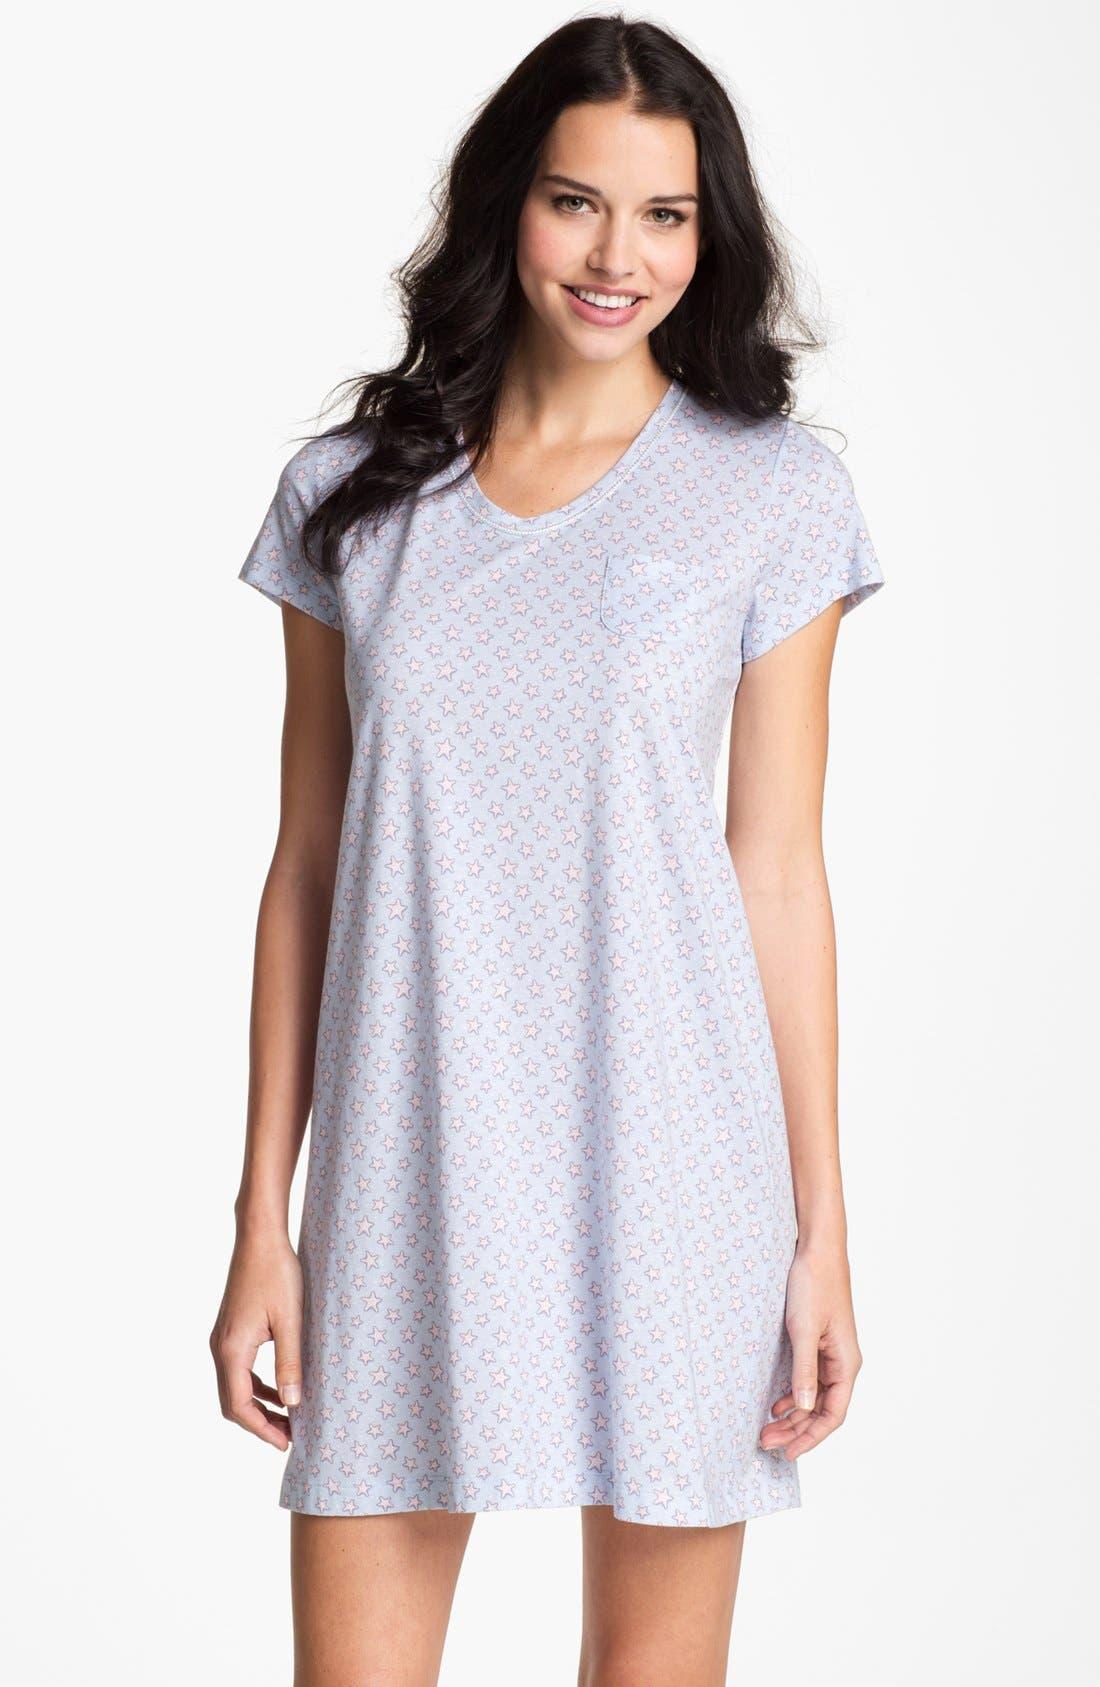 Alternate Image 1 Selected - Carole Hochman Designs Scoop Neck Sleep Shirt